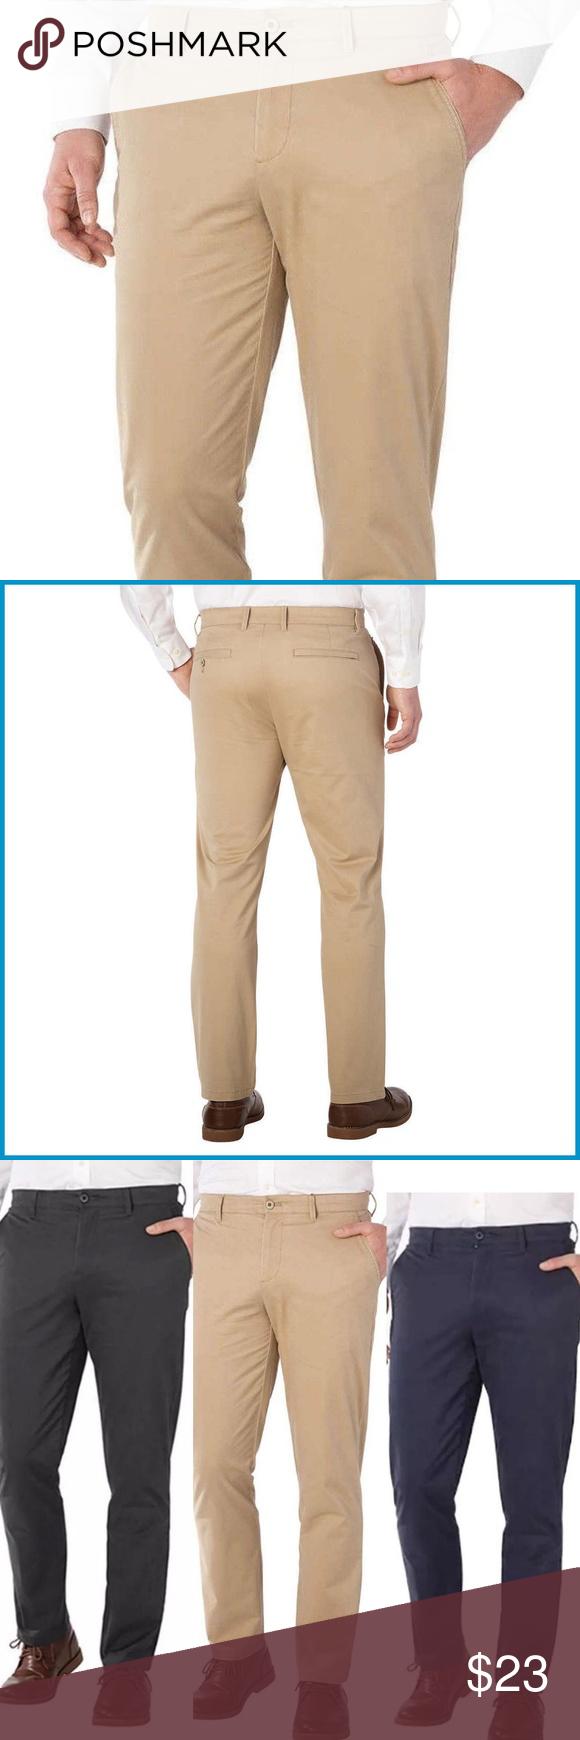 English Laundry Men S Straight Leg Chinos Pants Nwt Chinos